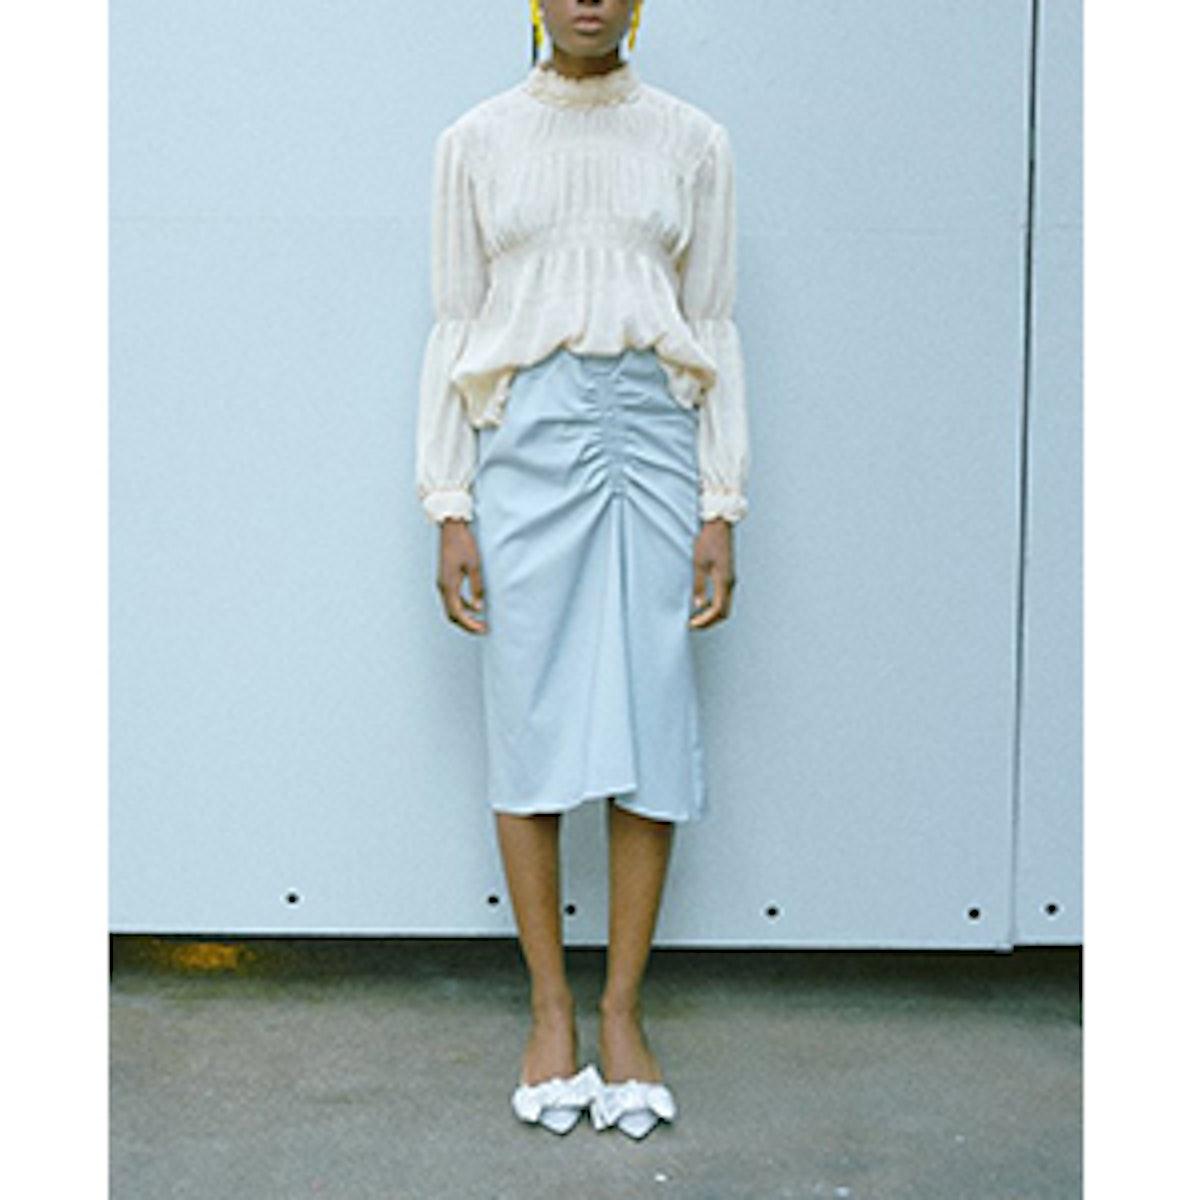 Binita Skirt